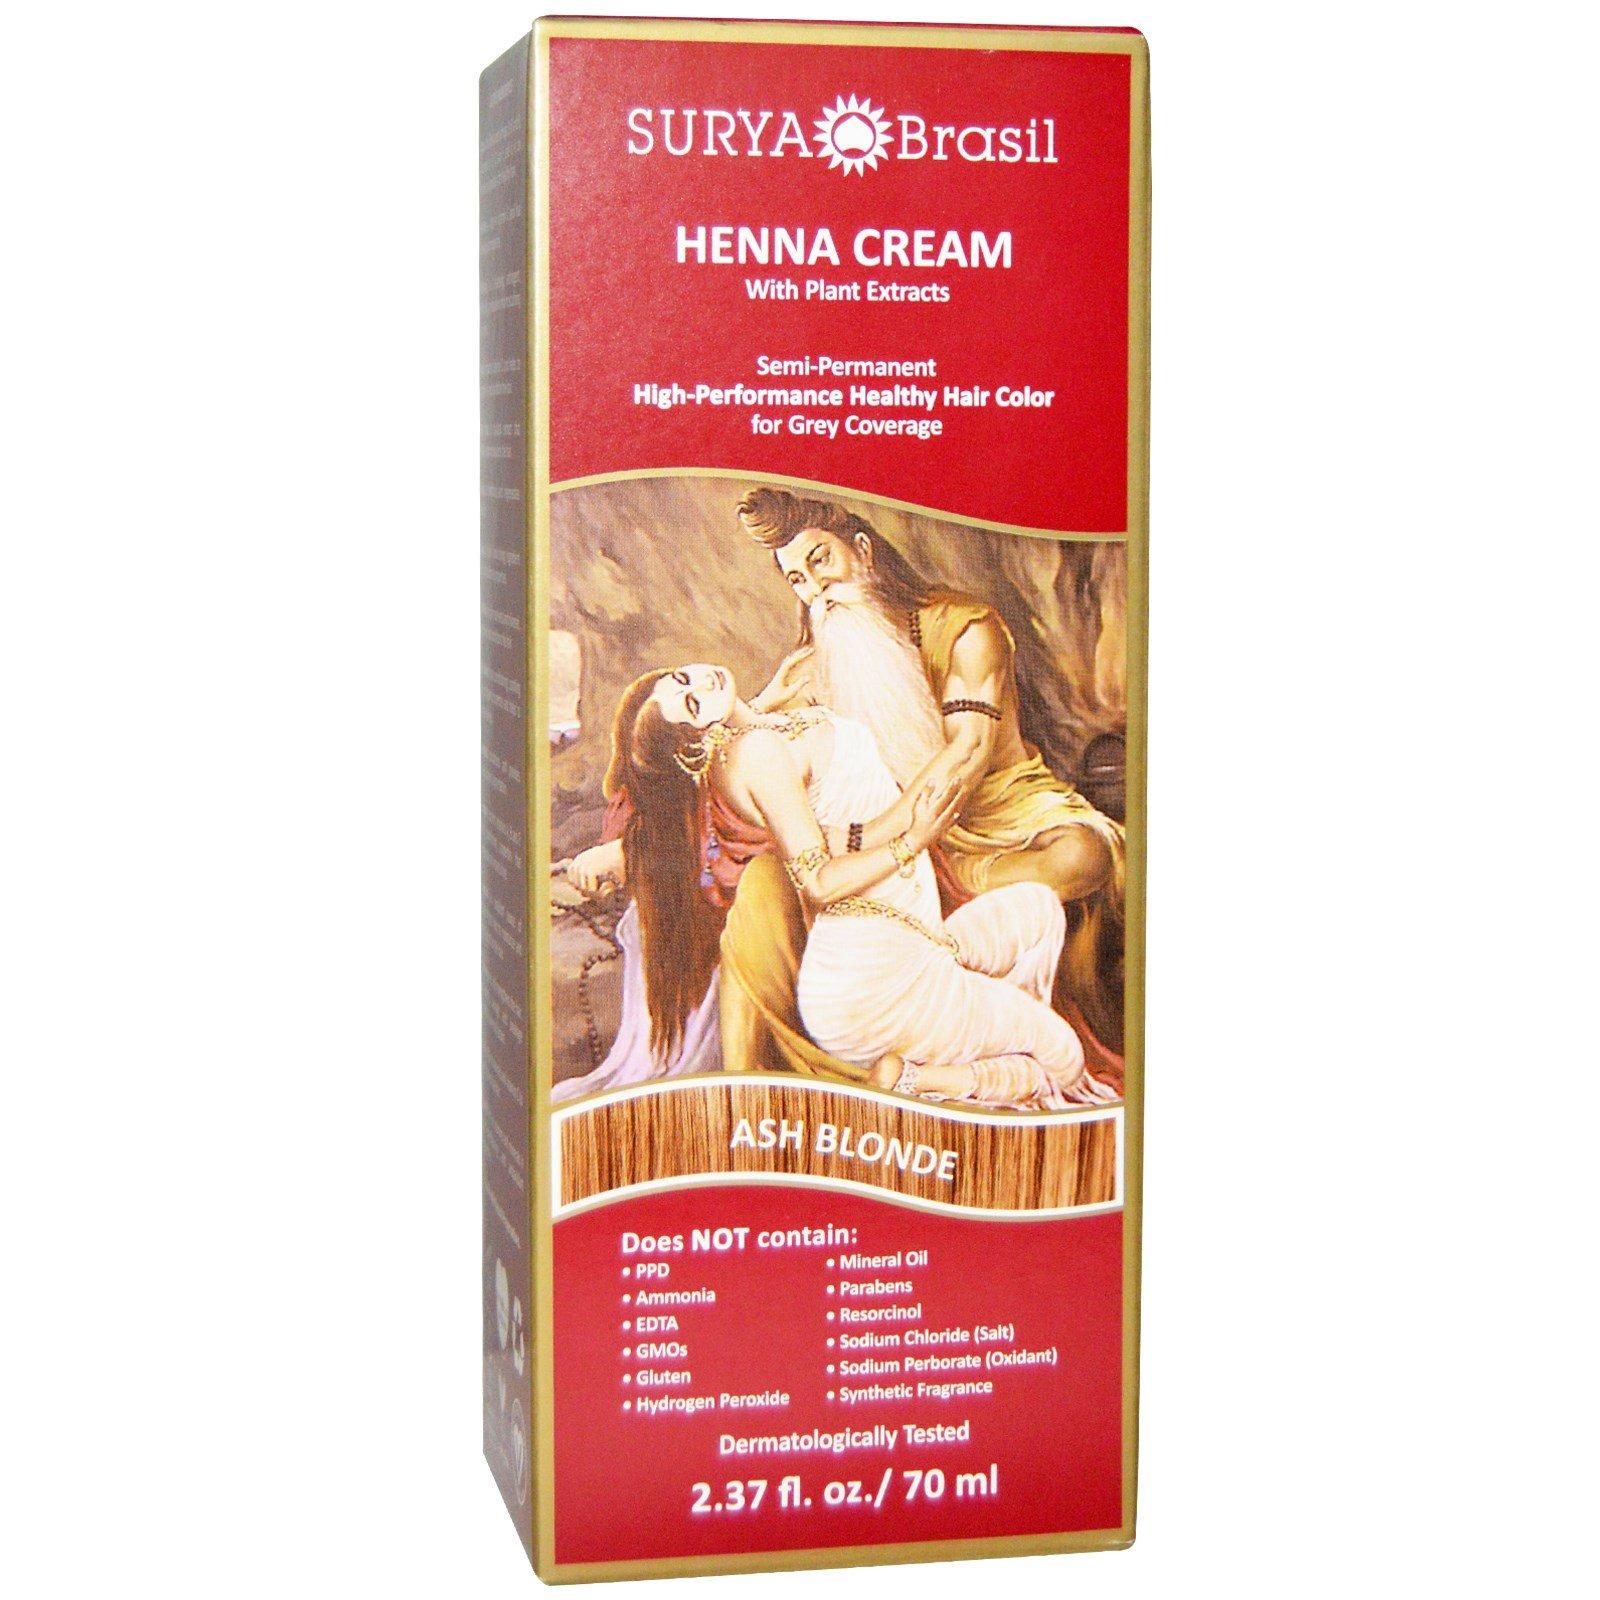 Surya Henna, Henna Cream, Hair Color and Conditioner, Ash Blonde, 2.37 fl oz (70 ml) - 3PC